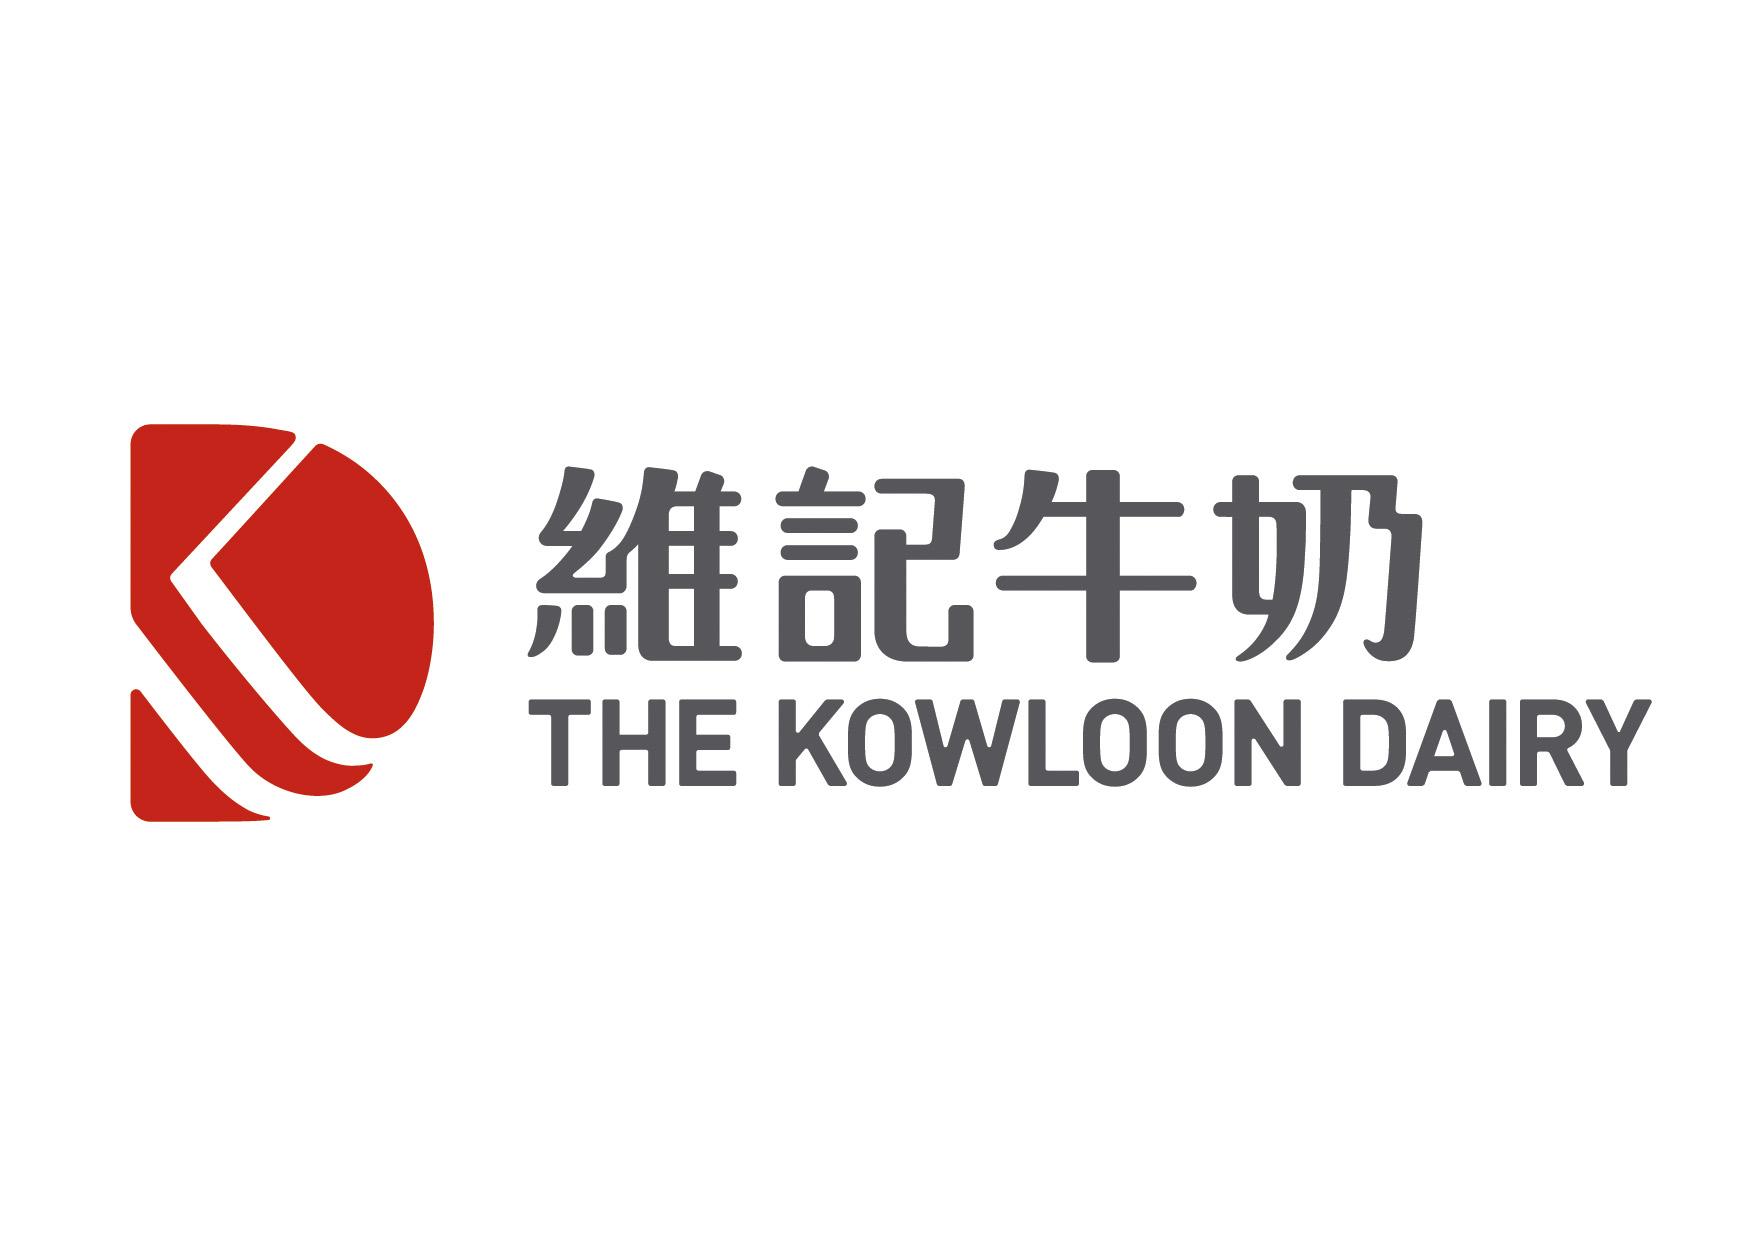 logo Kowloon Dairy